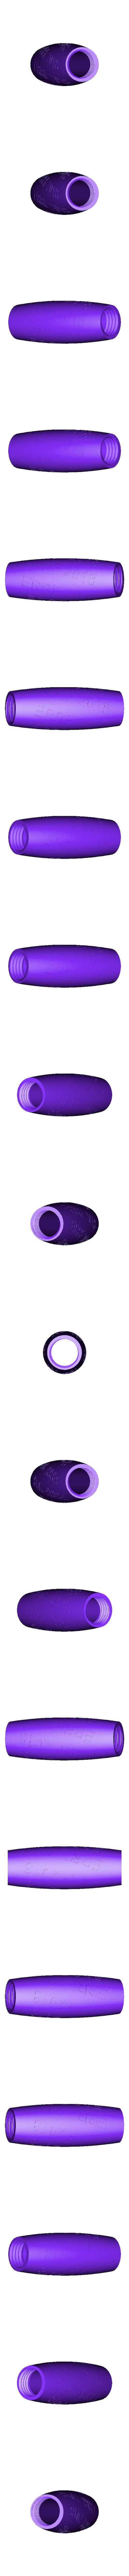 Errf_2018.stl Download free STL file ERRF 2018 Rolling stick thingie • 3D printing design, Thomllama